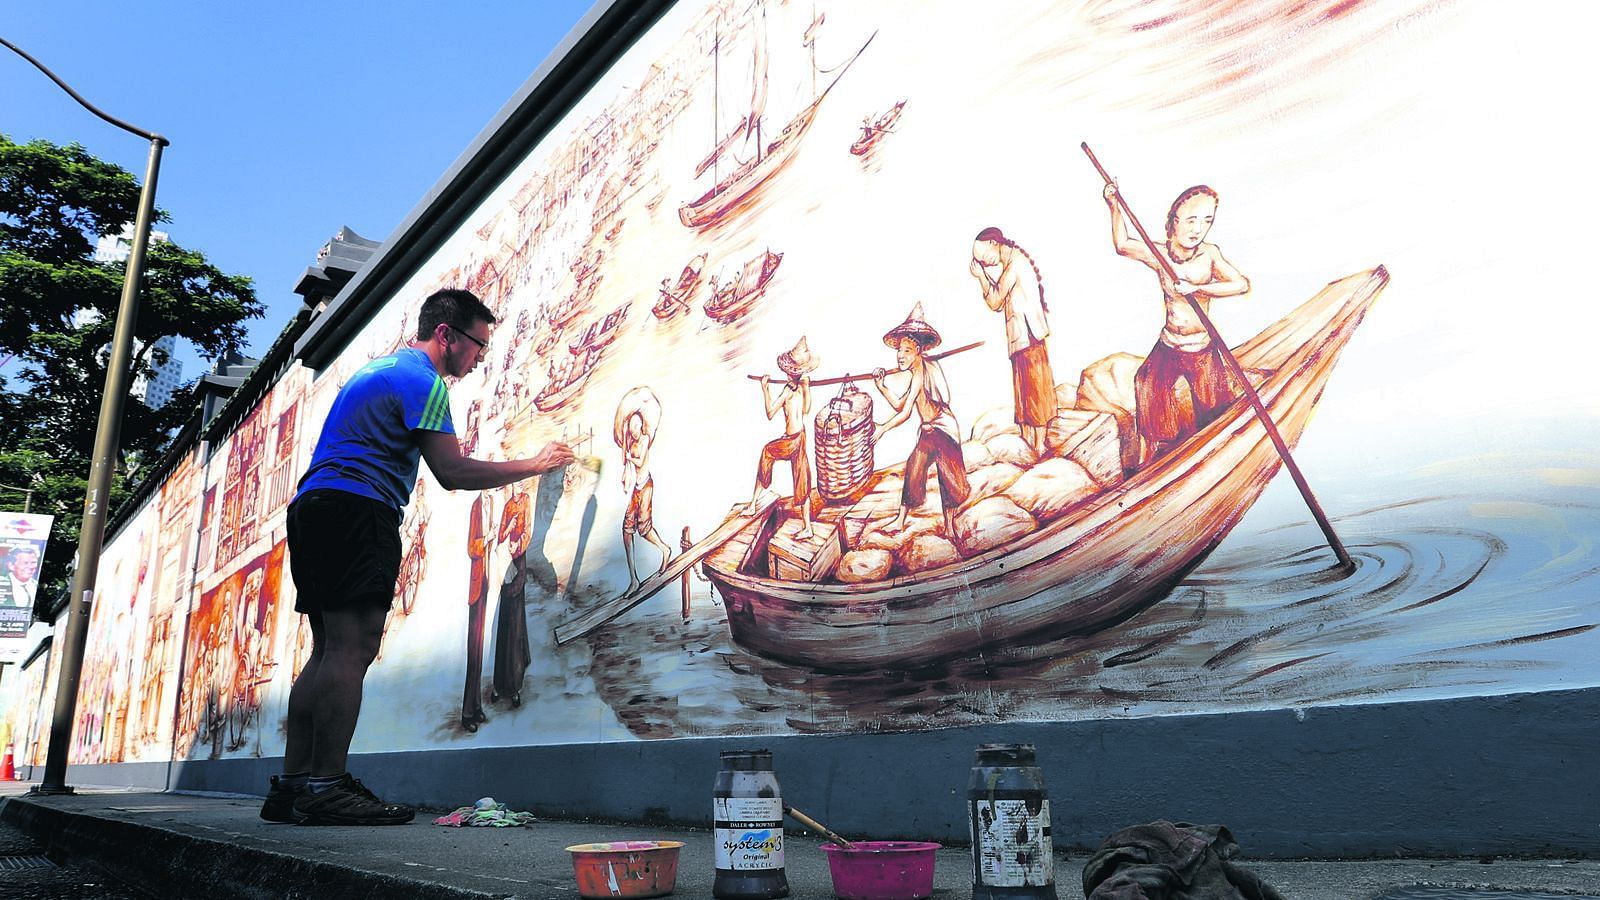 Yip Yew Chong Singapore Mural Artist Part 1 Of 4 Home Decor